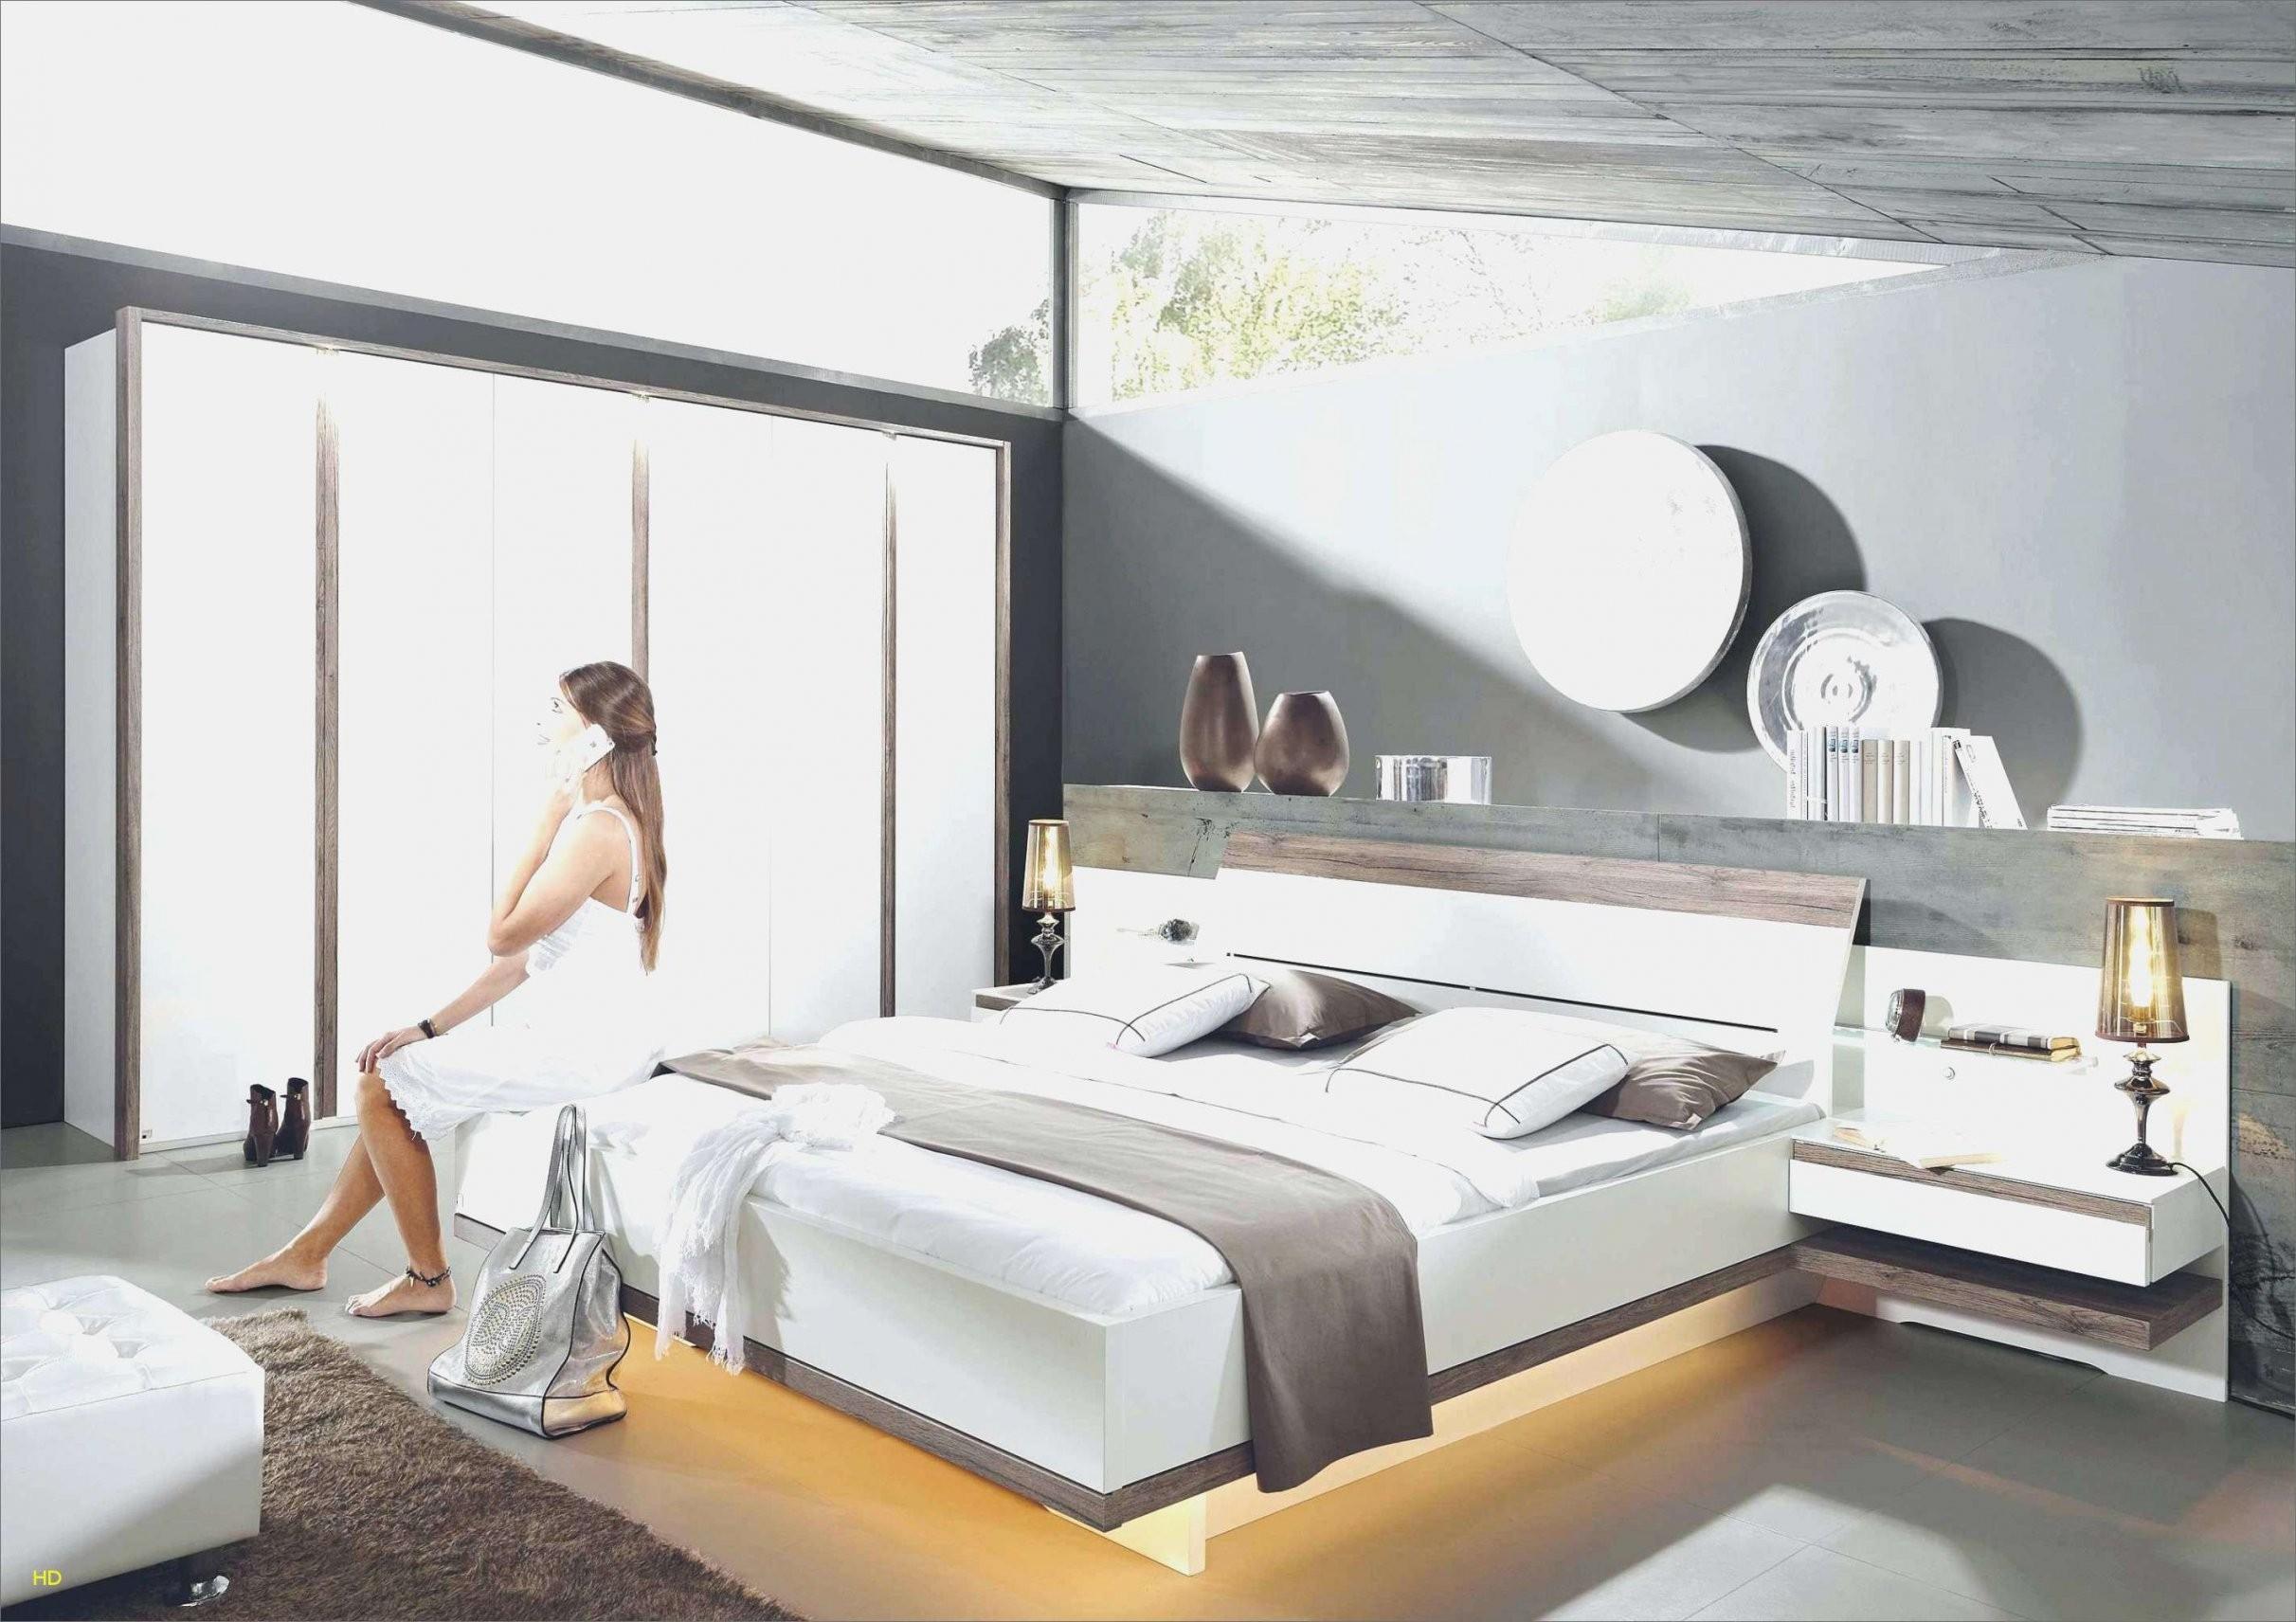 Bett 120 X 200 Fresh Mädchen Bett 120×200 Neu 14 Best Schöne Betten von Mädchen Bett 140X200 Bild